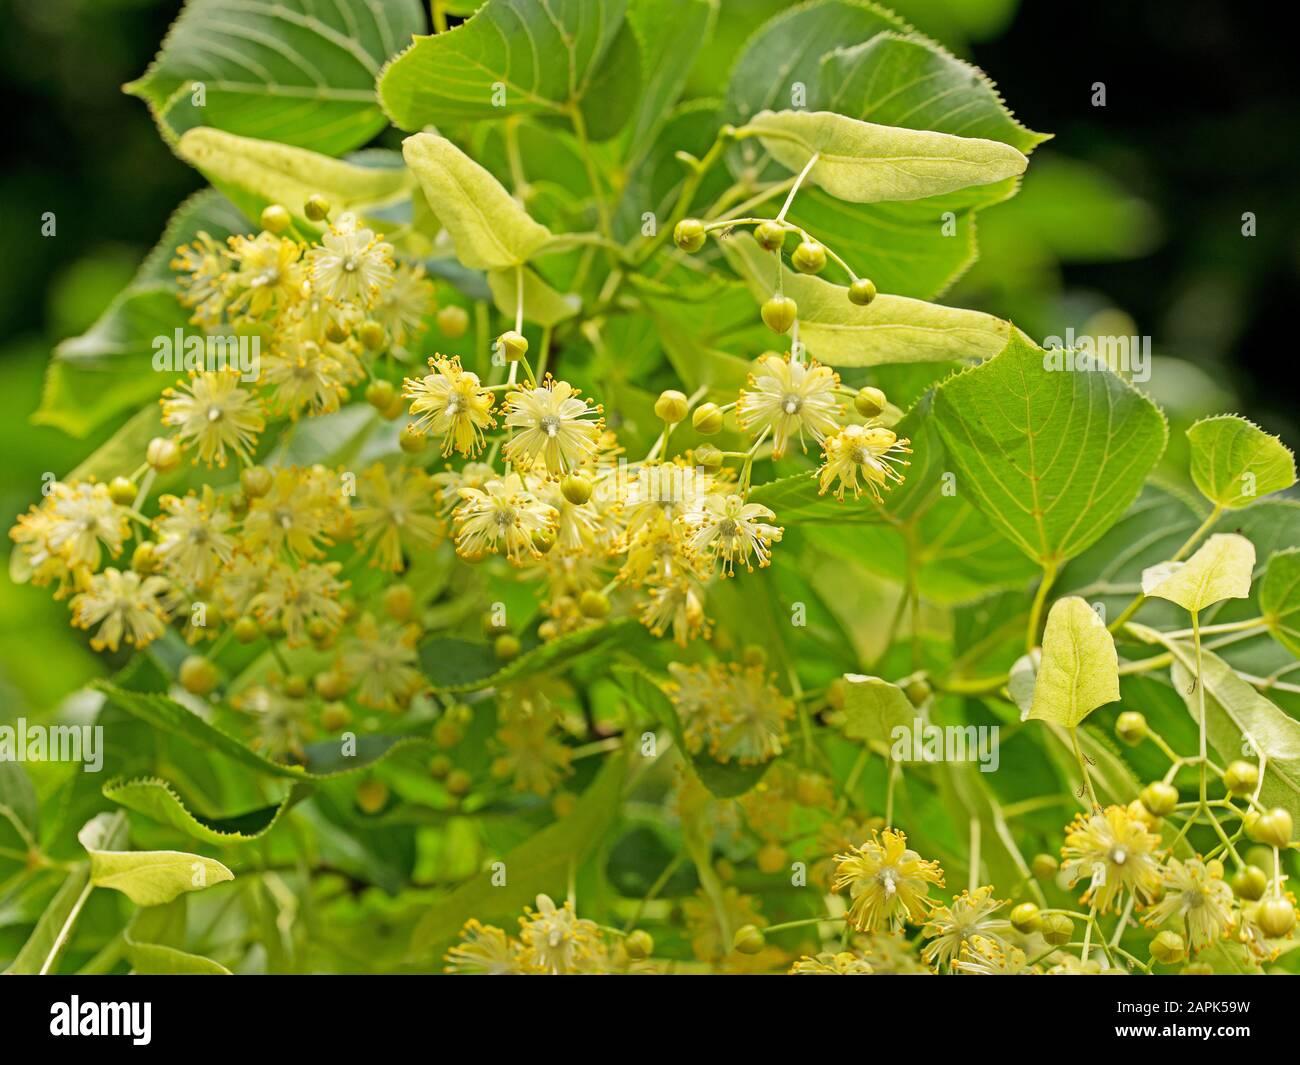 Flowering linden, Tilia Stock Photo